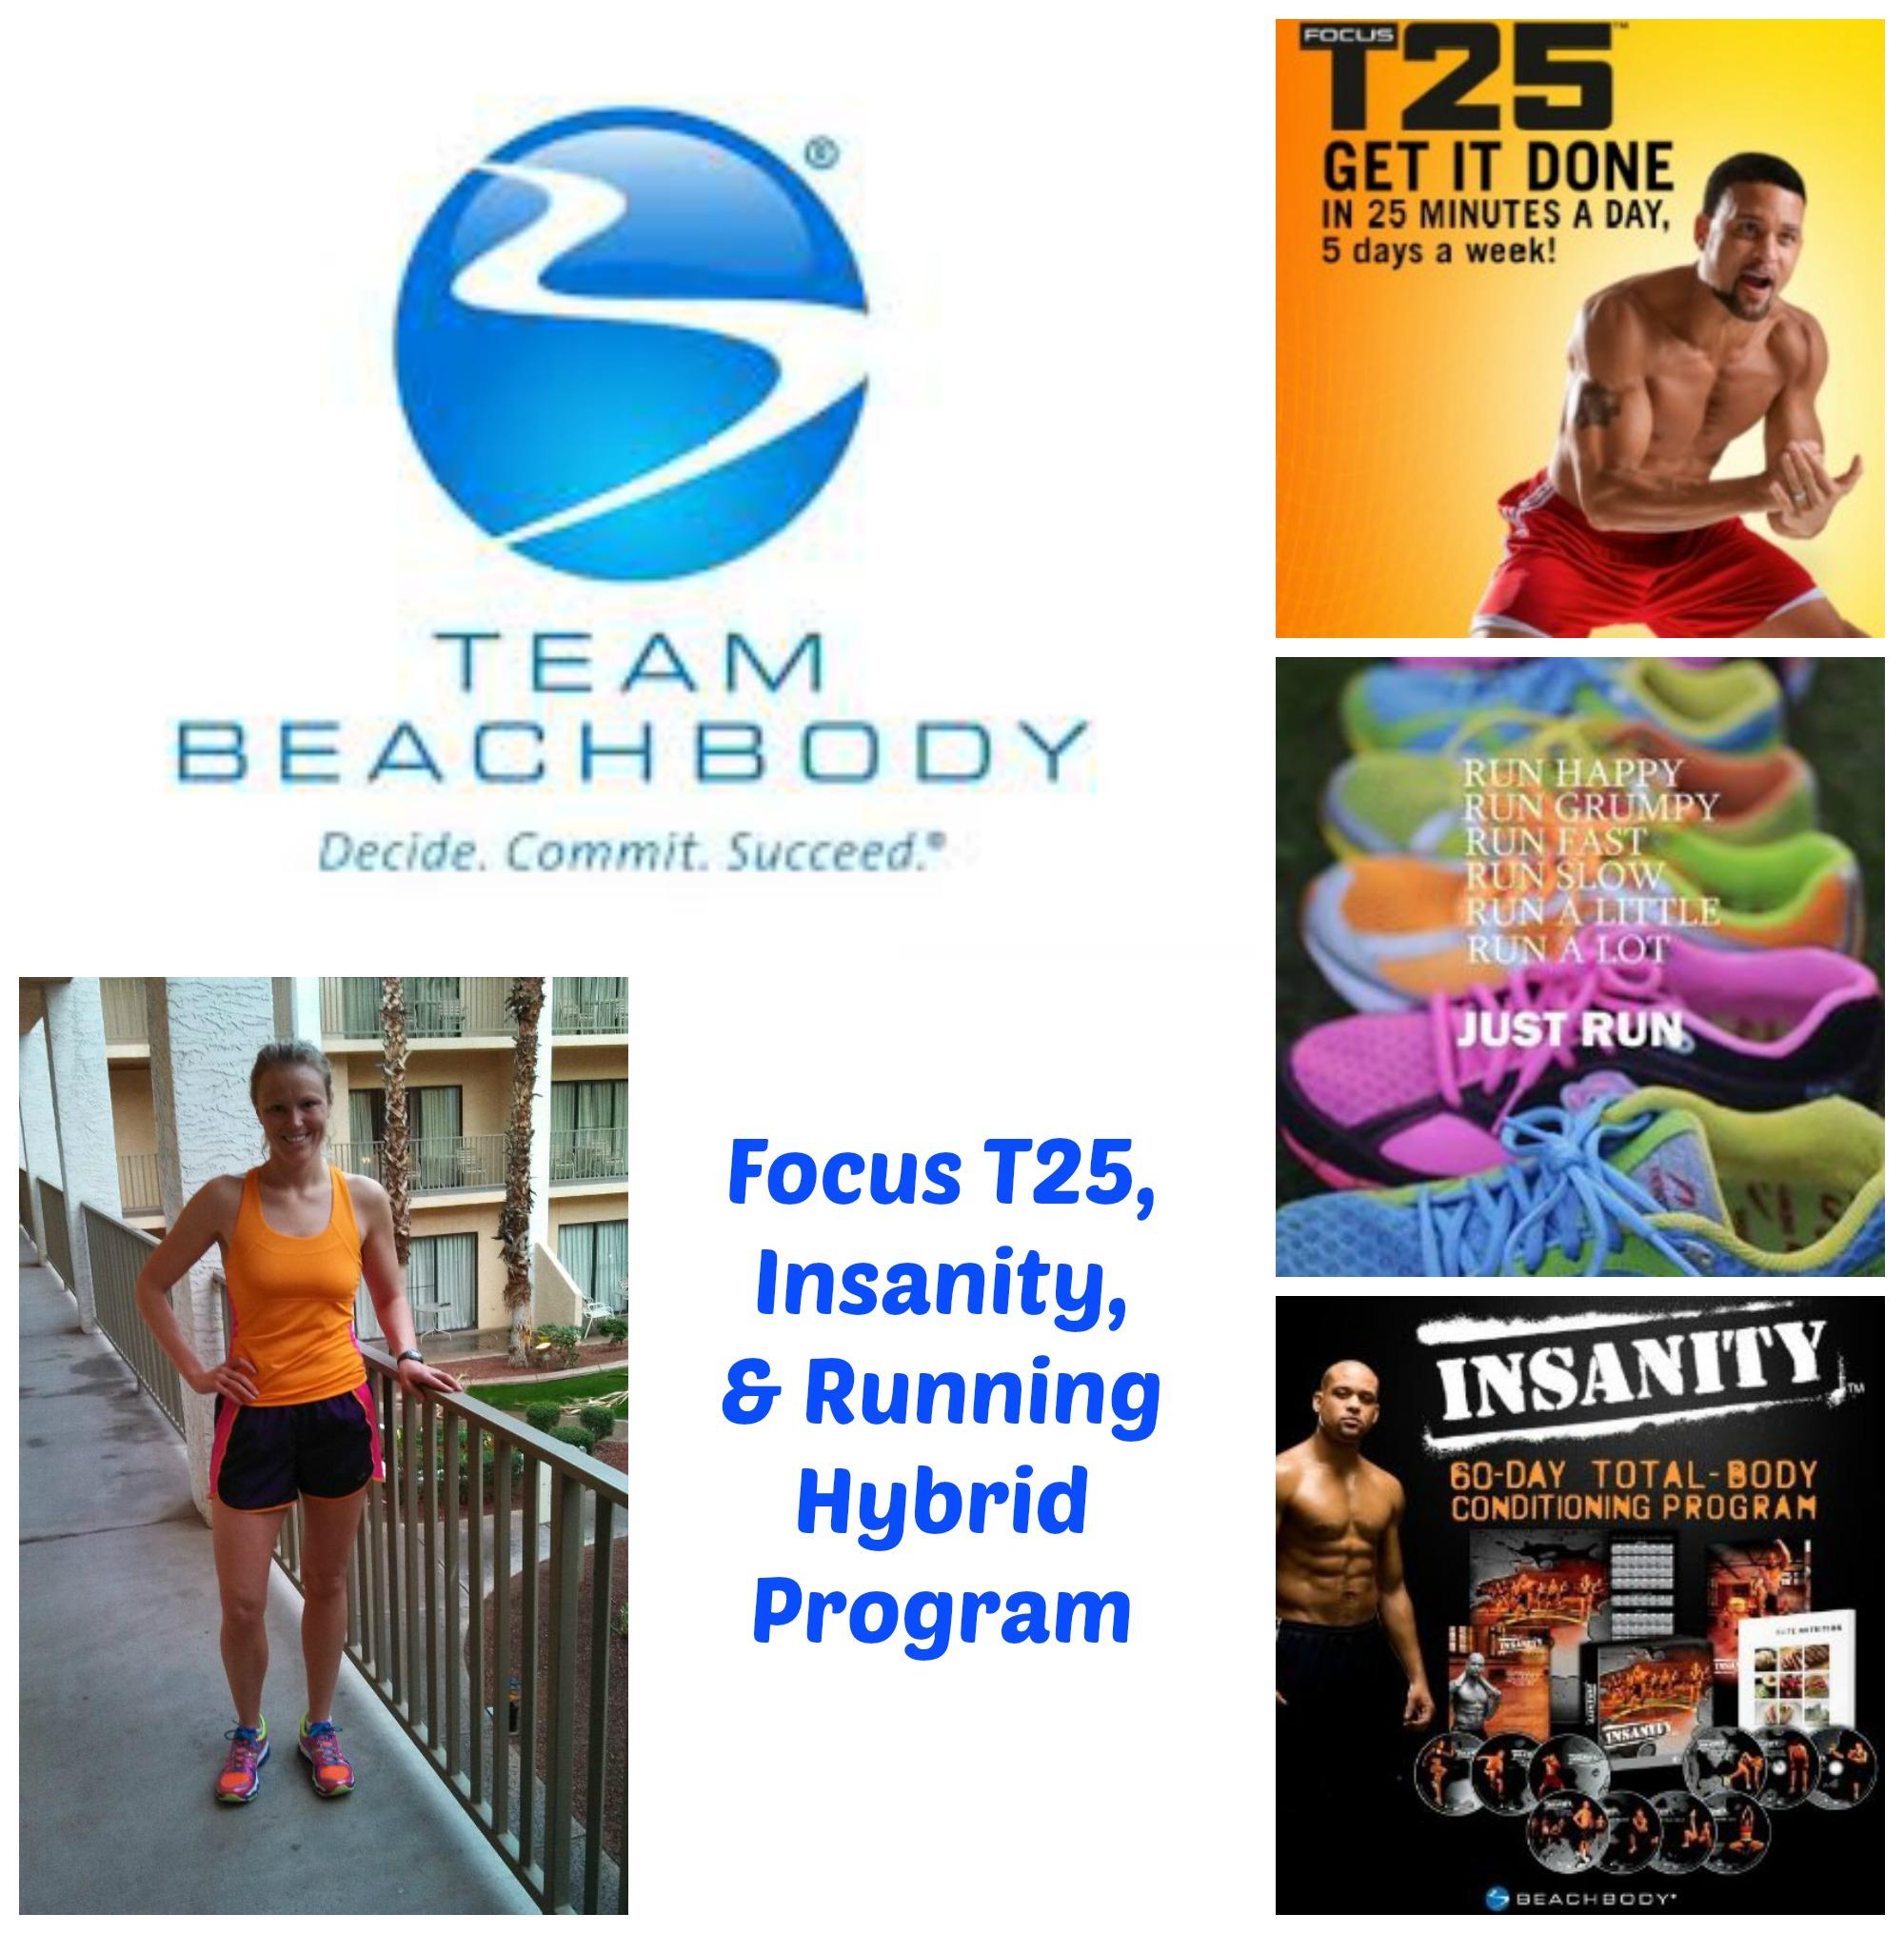 Focus T25, Insanity, & Running Hybrid Program | Debbie's